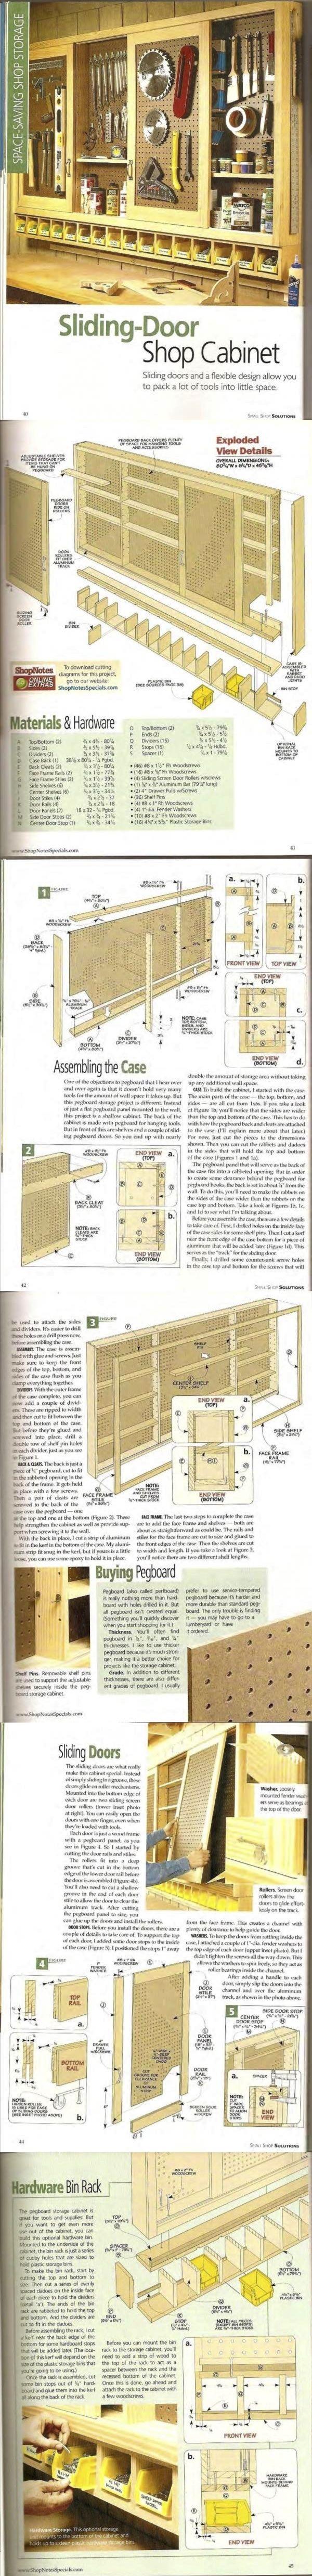 Sliding Door Shop Cabinet Shopnotes Magazine Small Shop